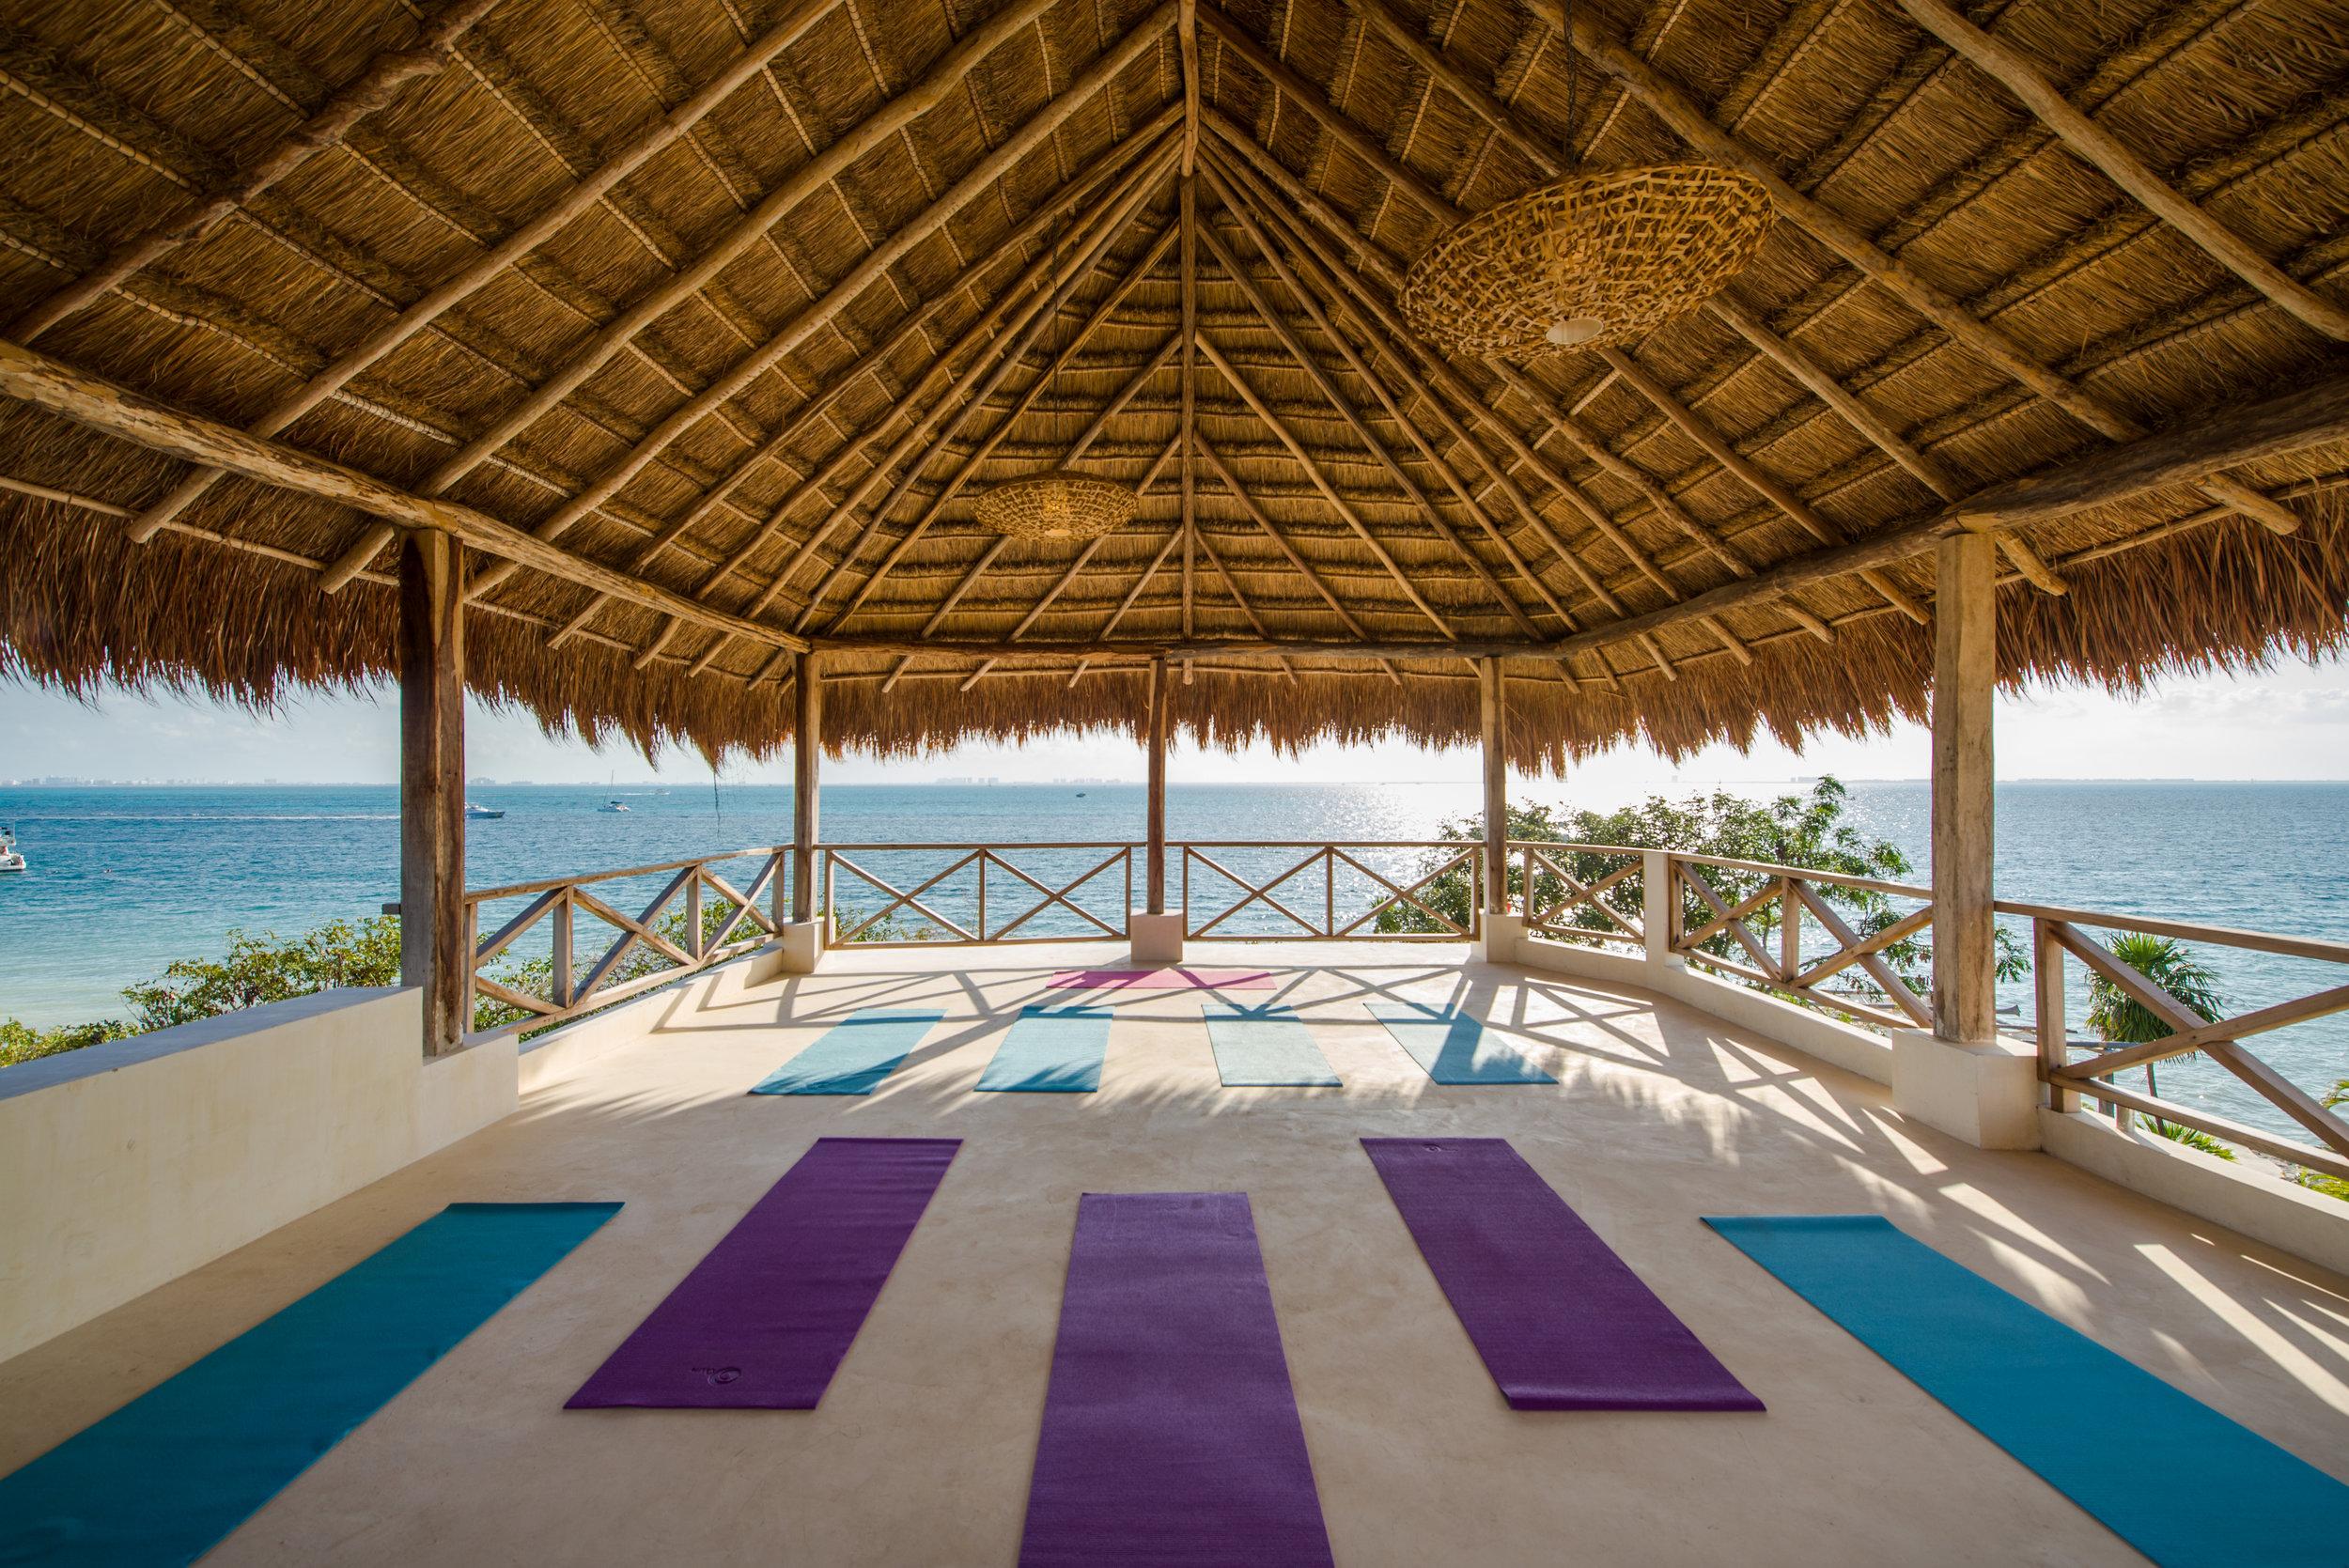 Casa Coco Isla Mujeres-7375.jpg